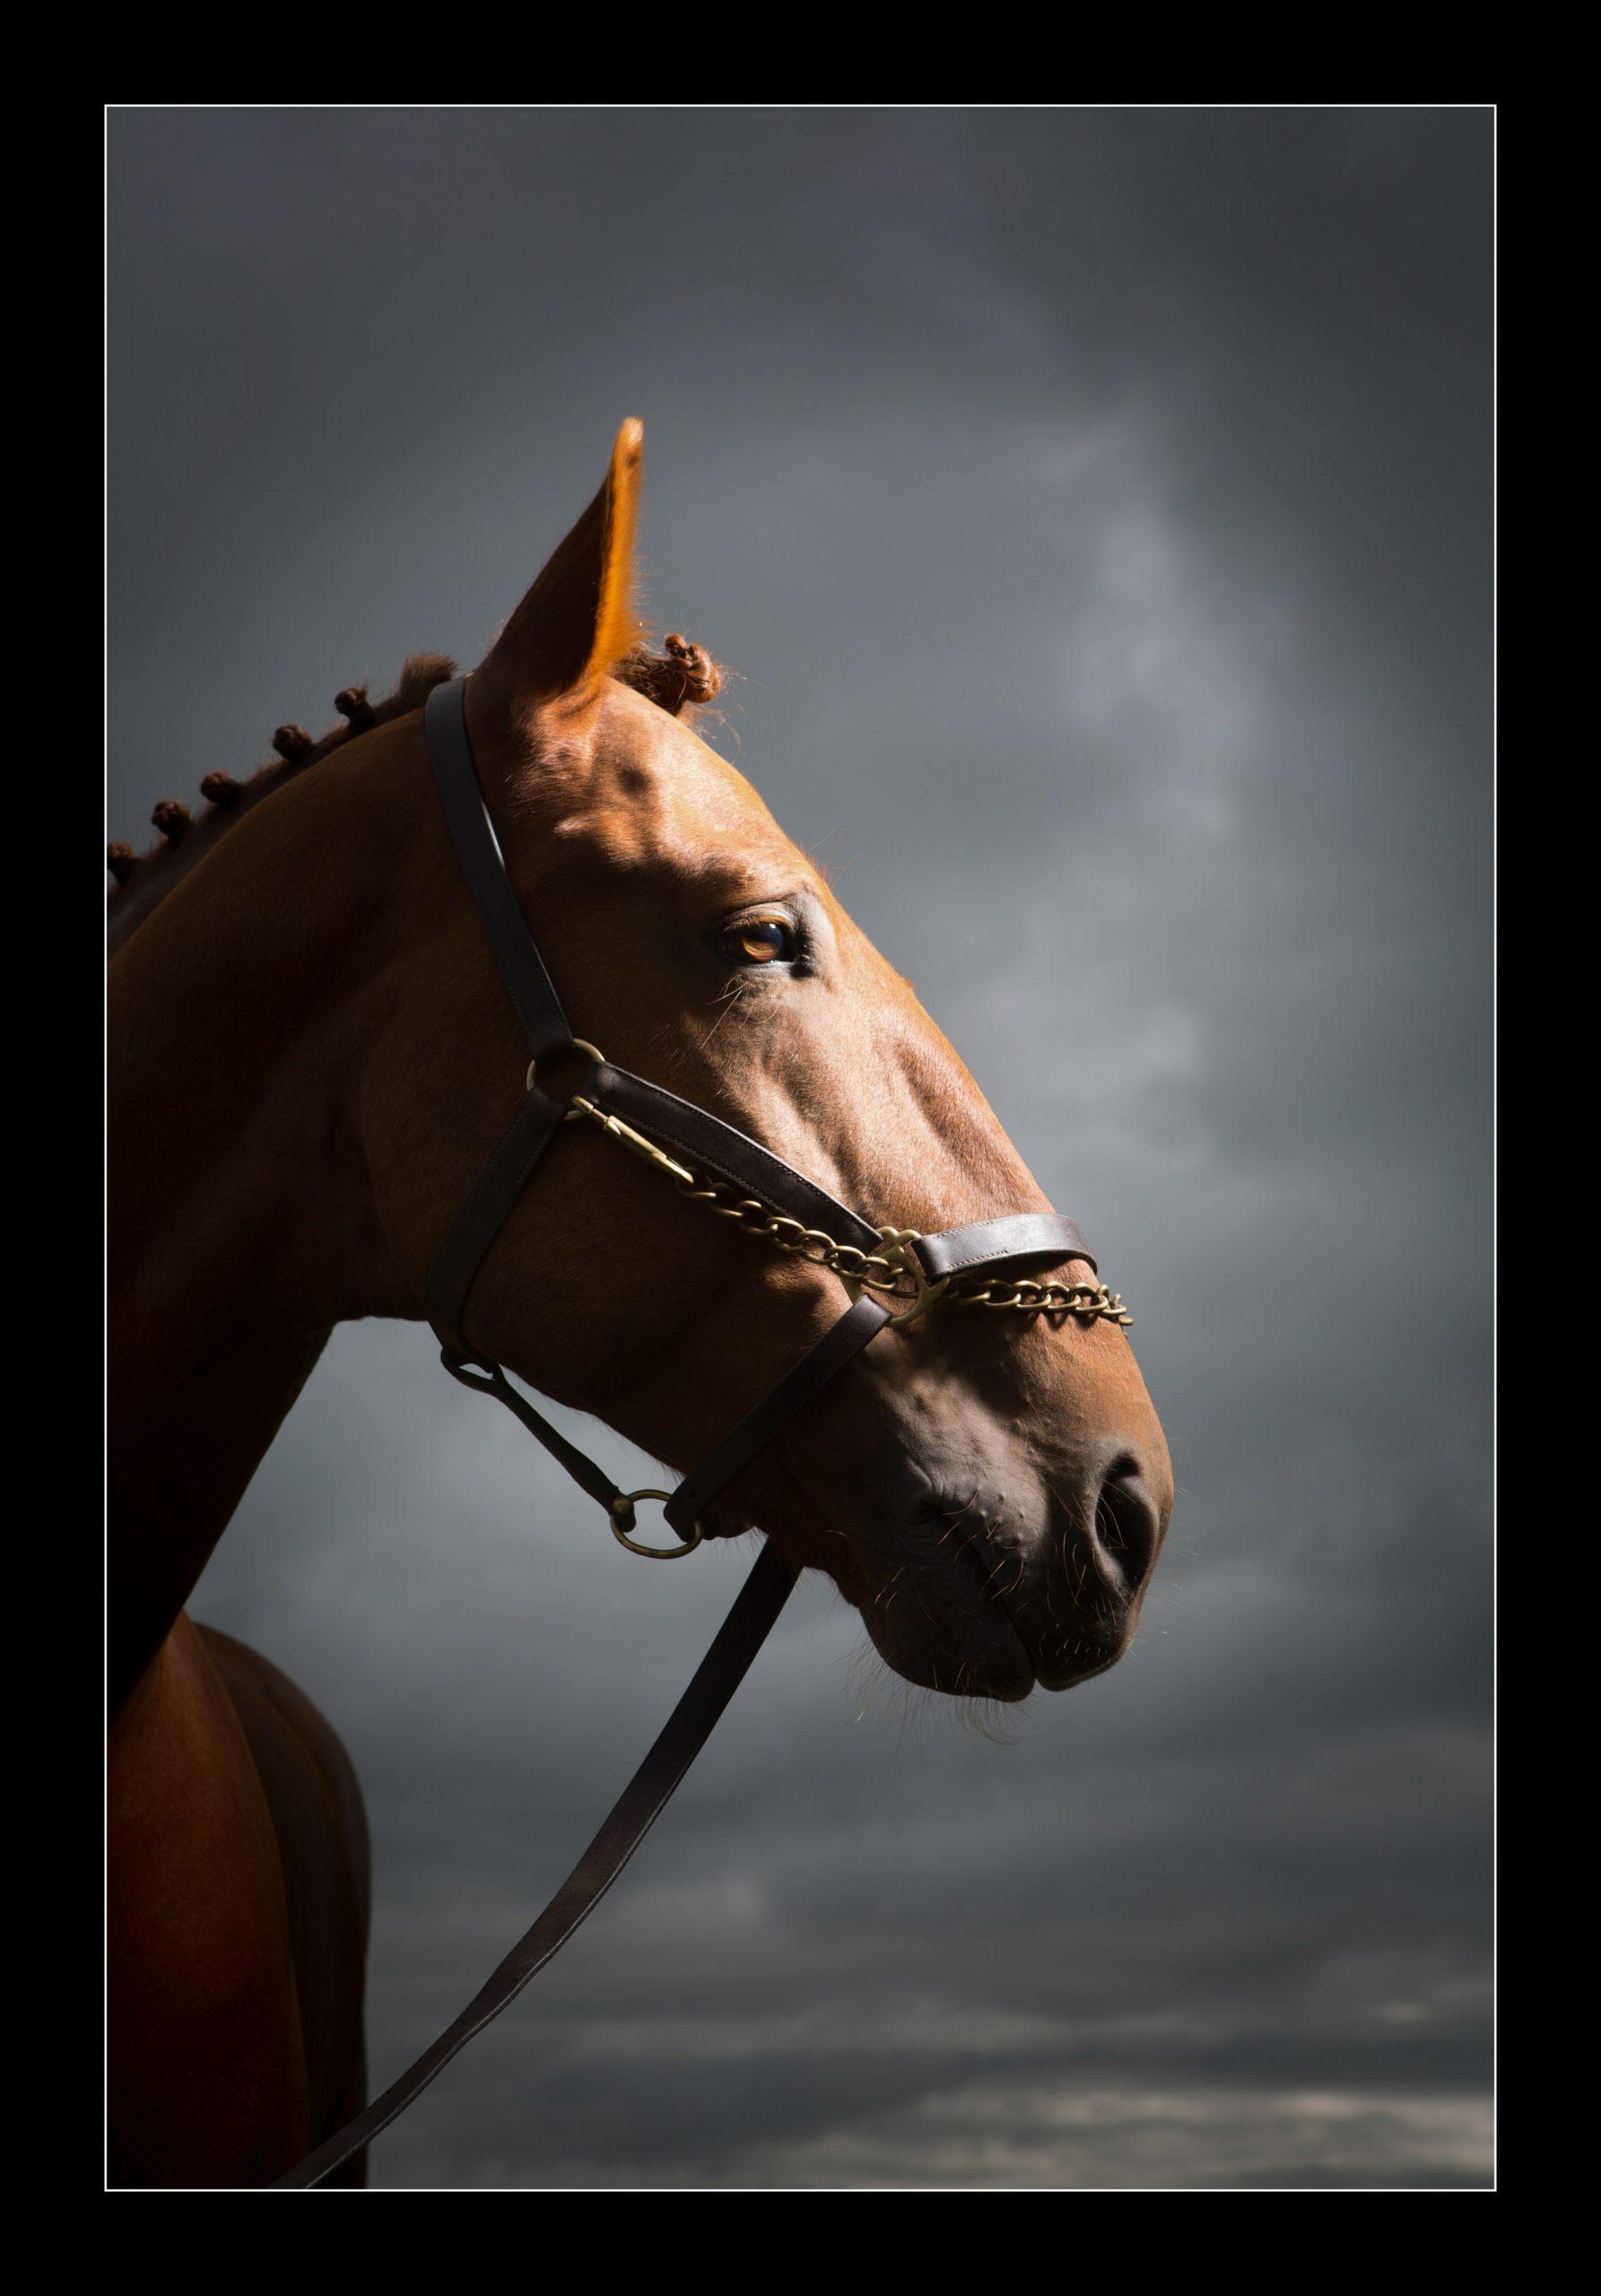 equine-6166 copy-min